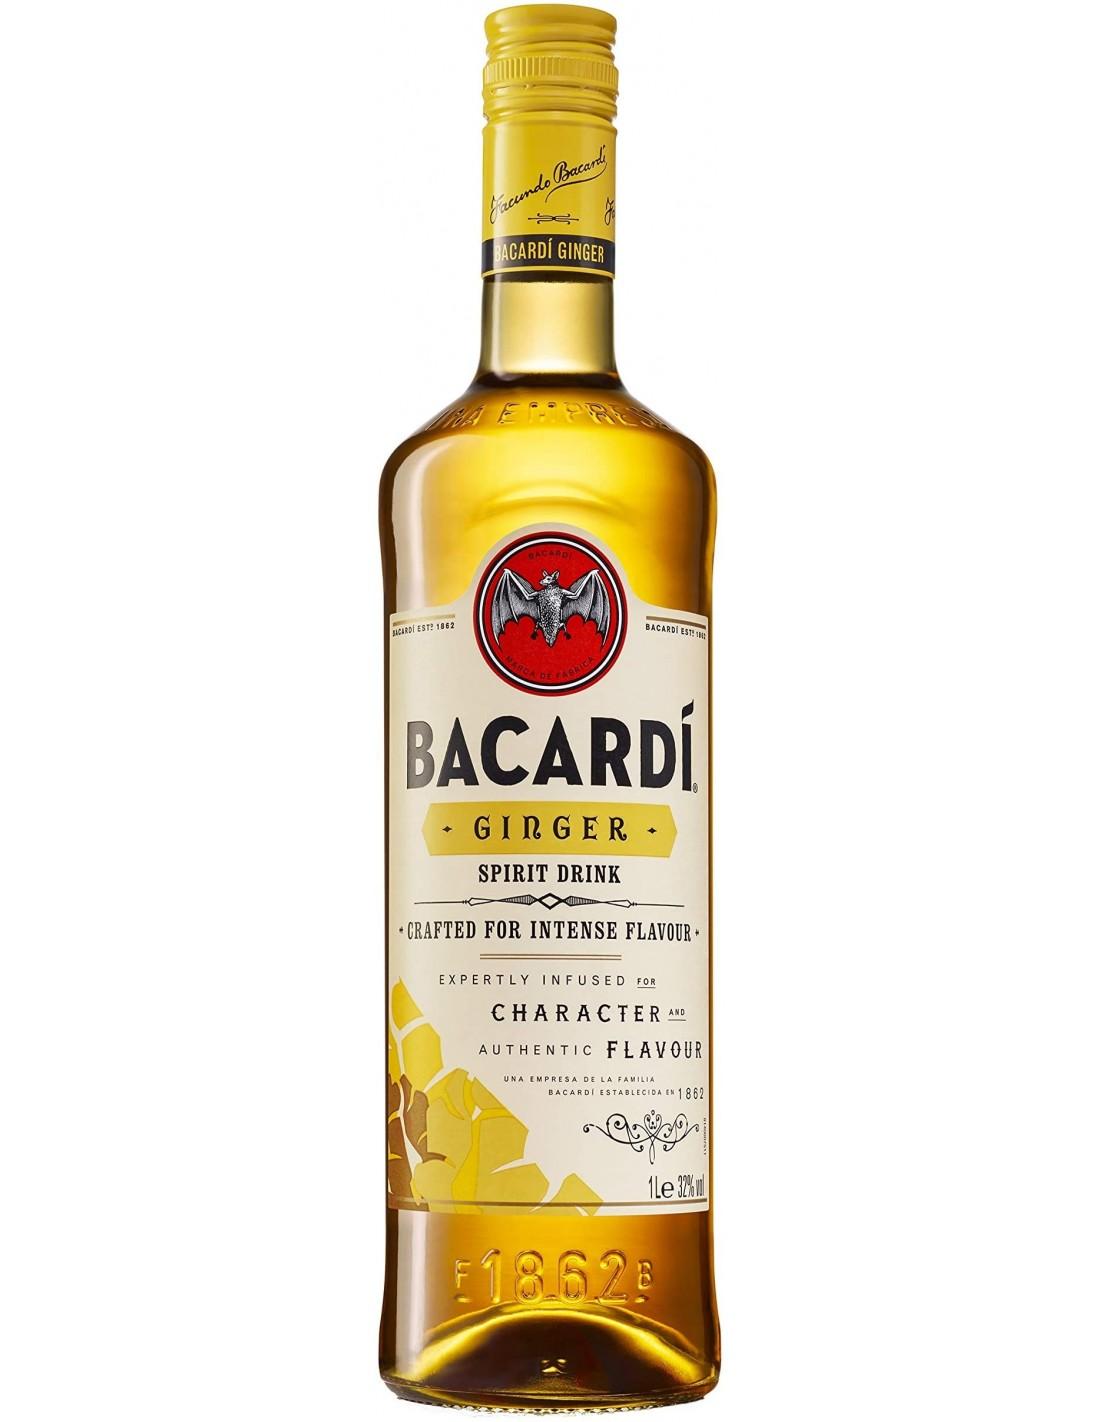 Rom Bacardi Ginger, 0.7L, 32% alc., Cuba